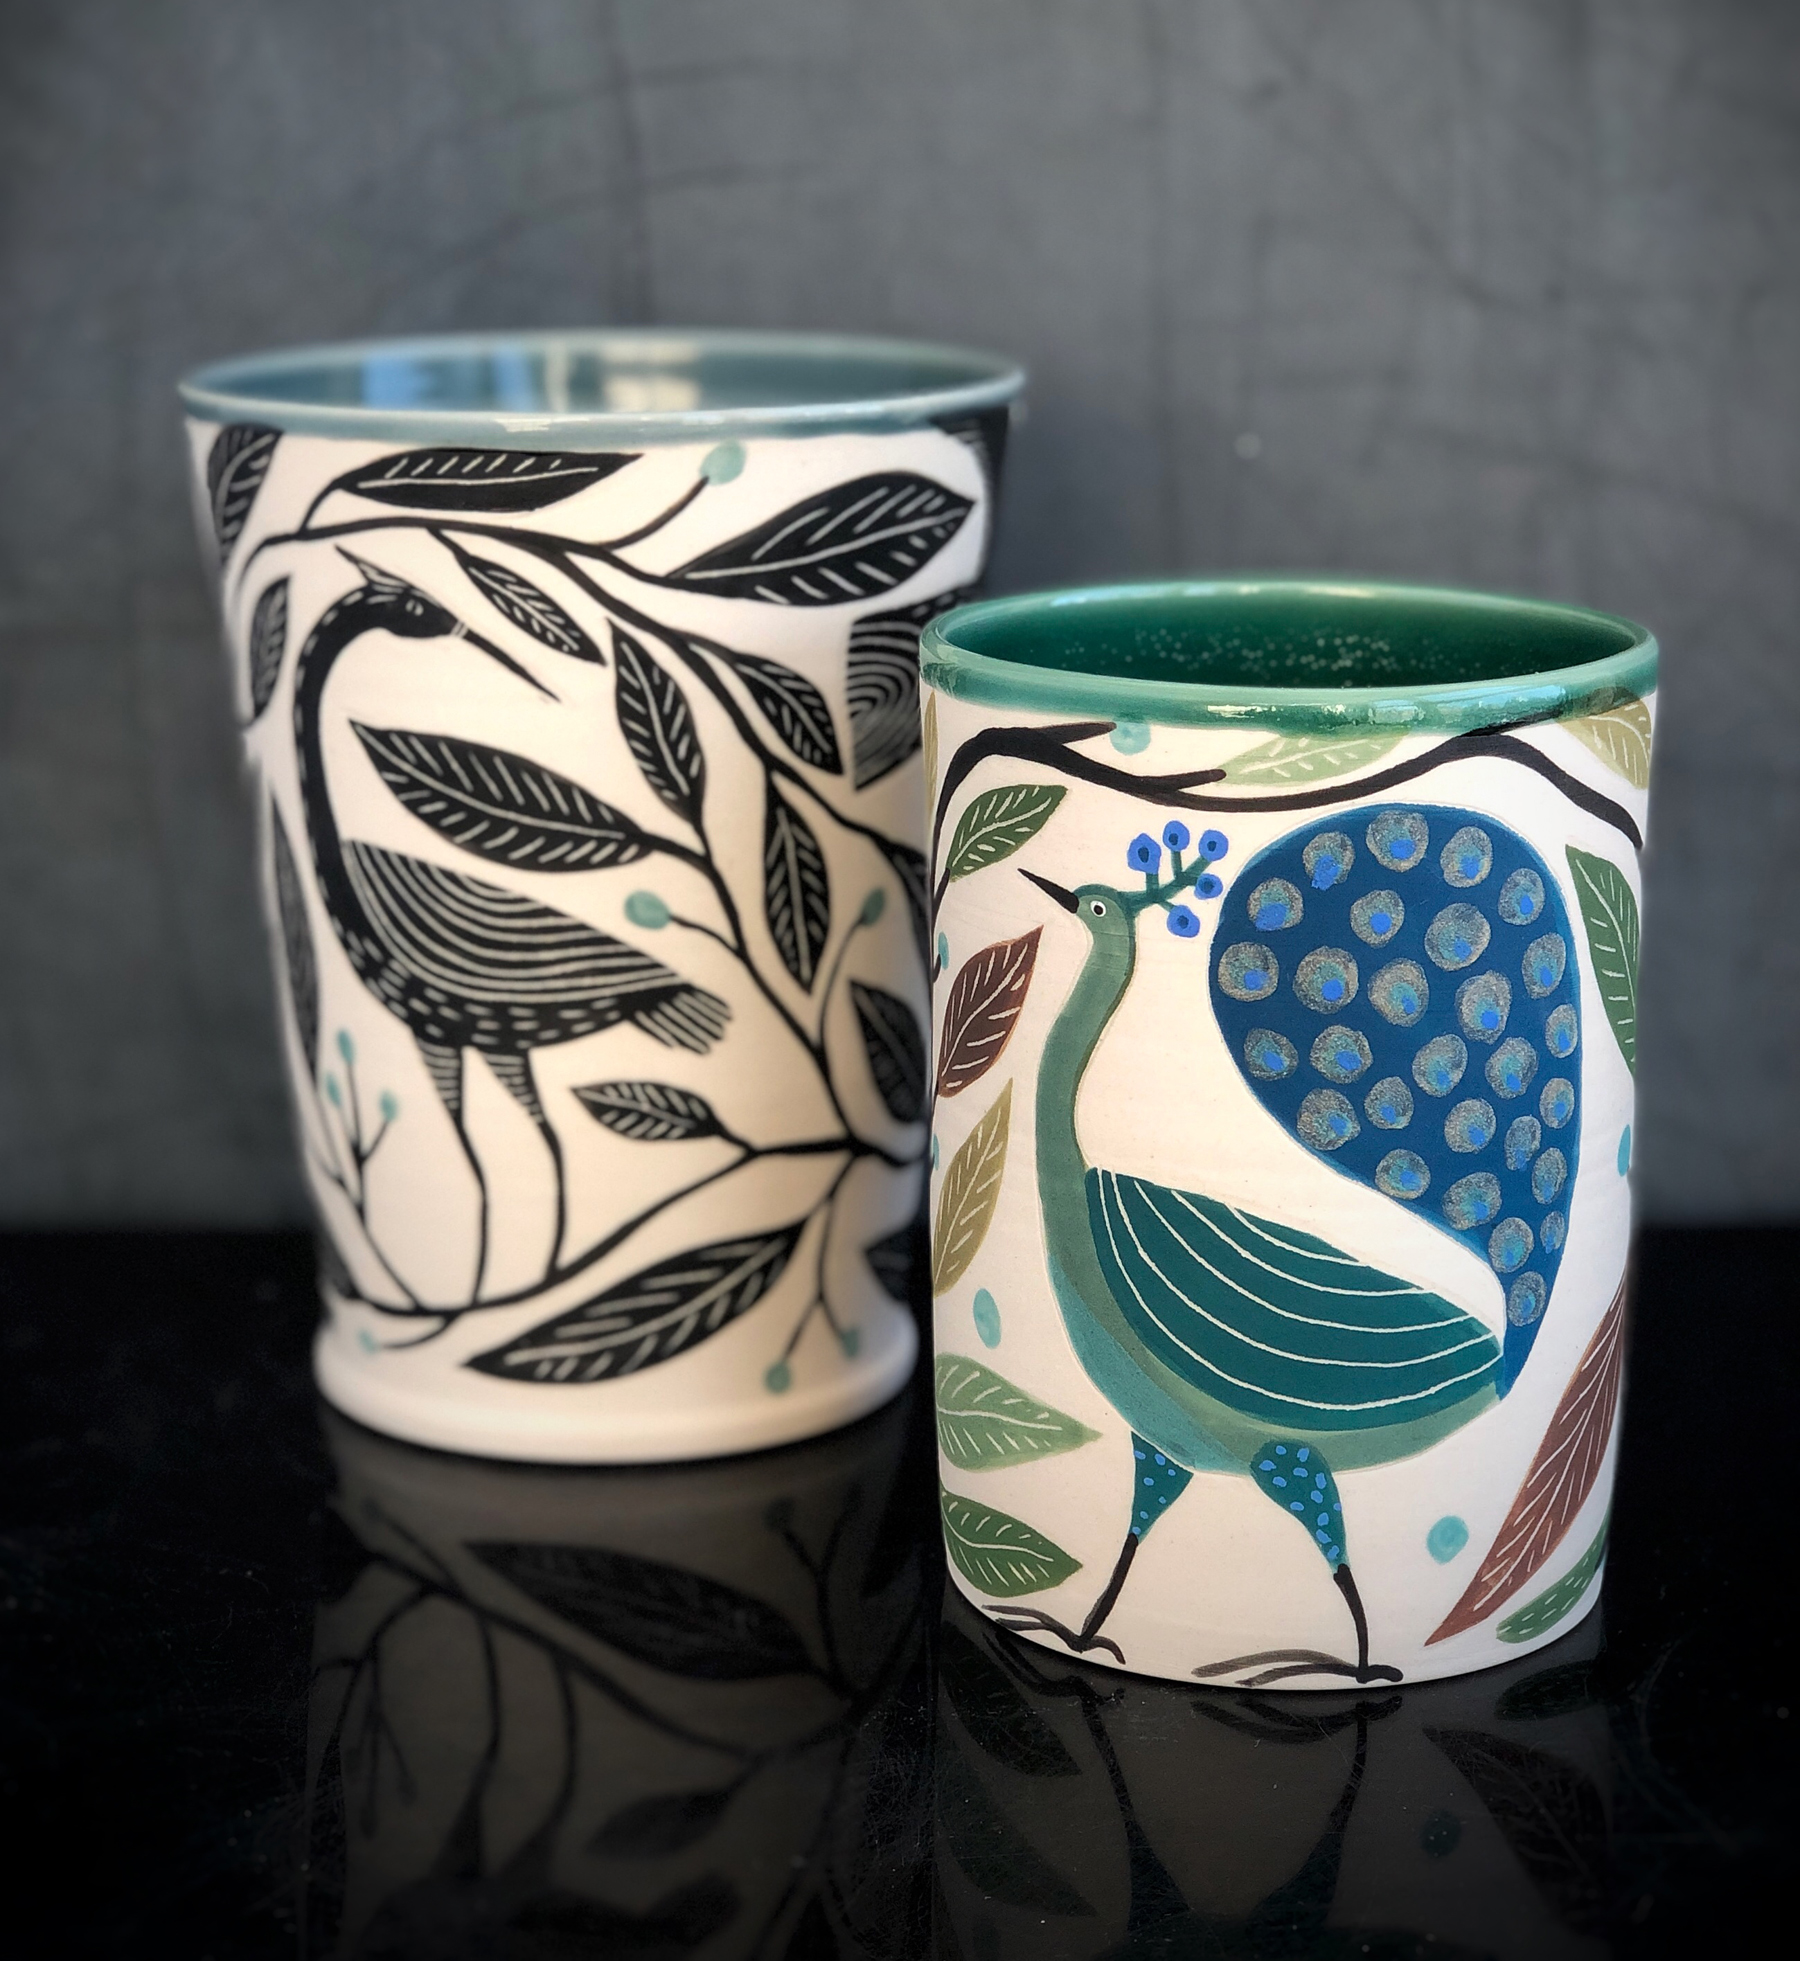 2-Gabrielle_Schaffner_porcelain-two_vases_with_birds.jpg